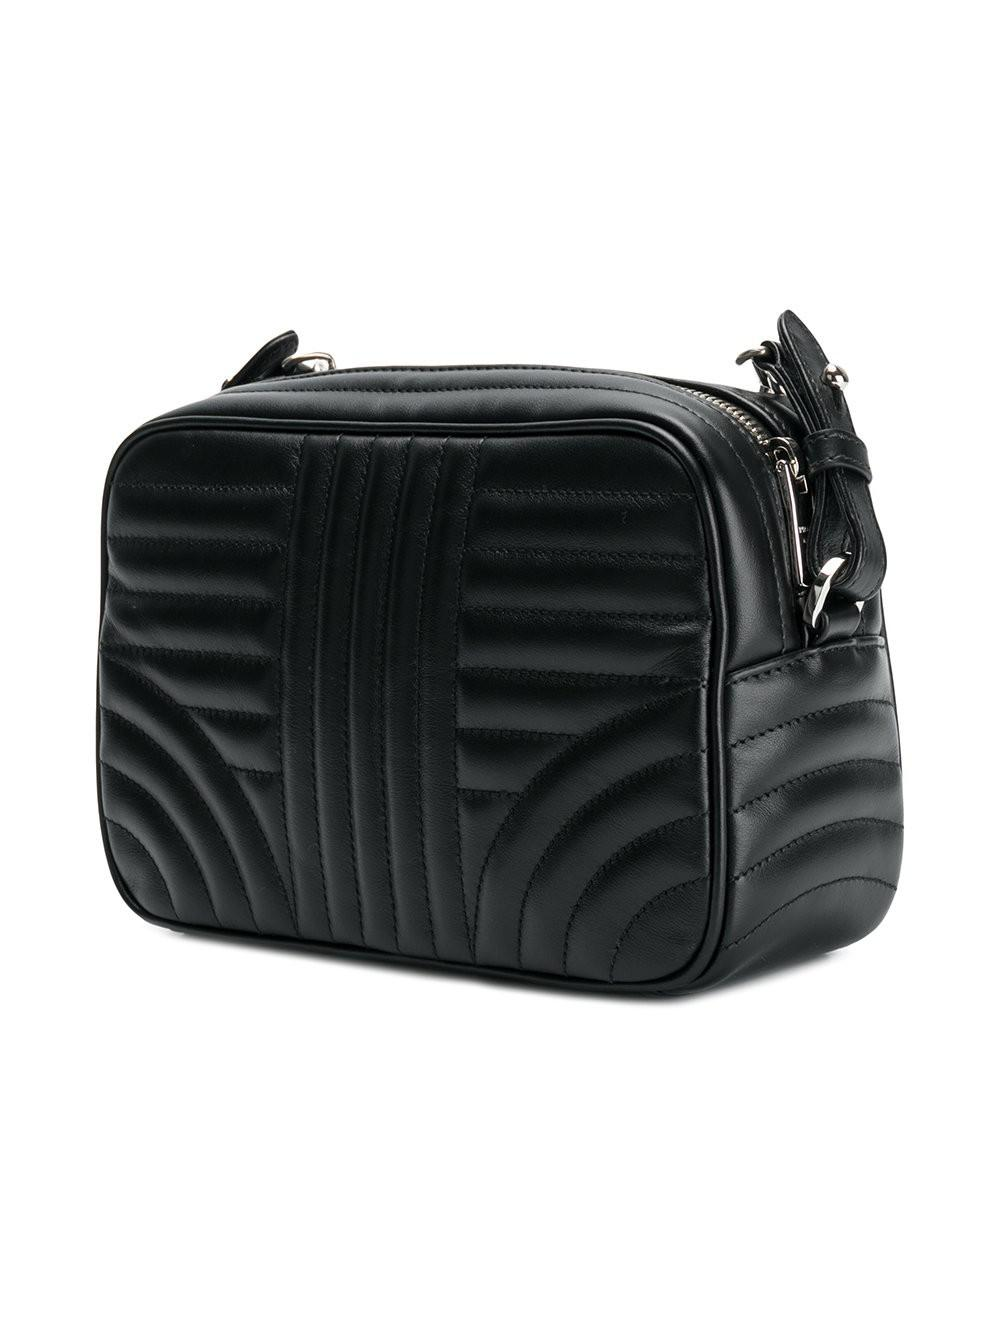 12d6b4e9d15aa Lyst - Prada Bevelled Camera Bag in Black